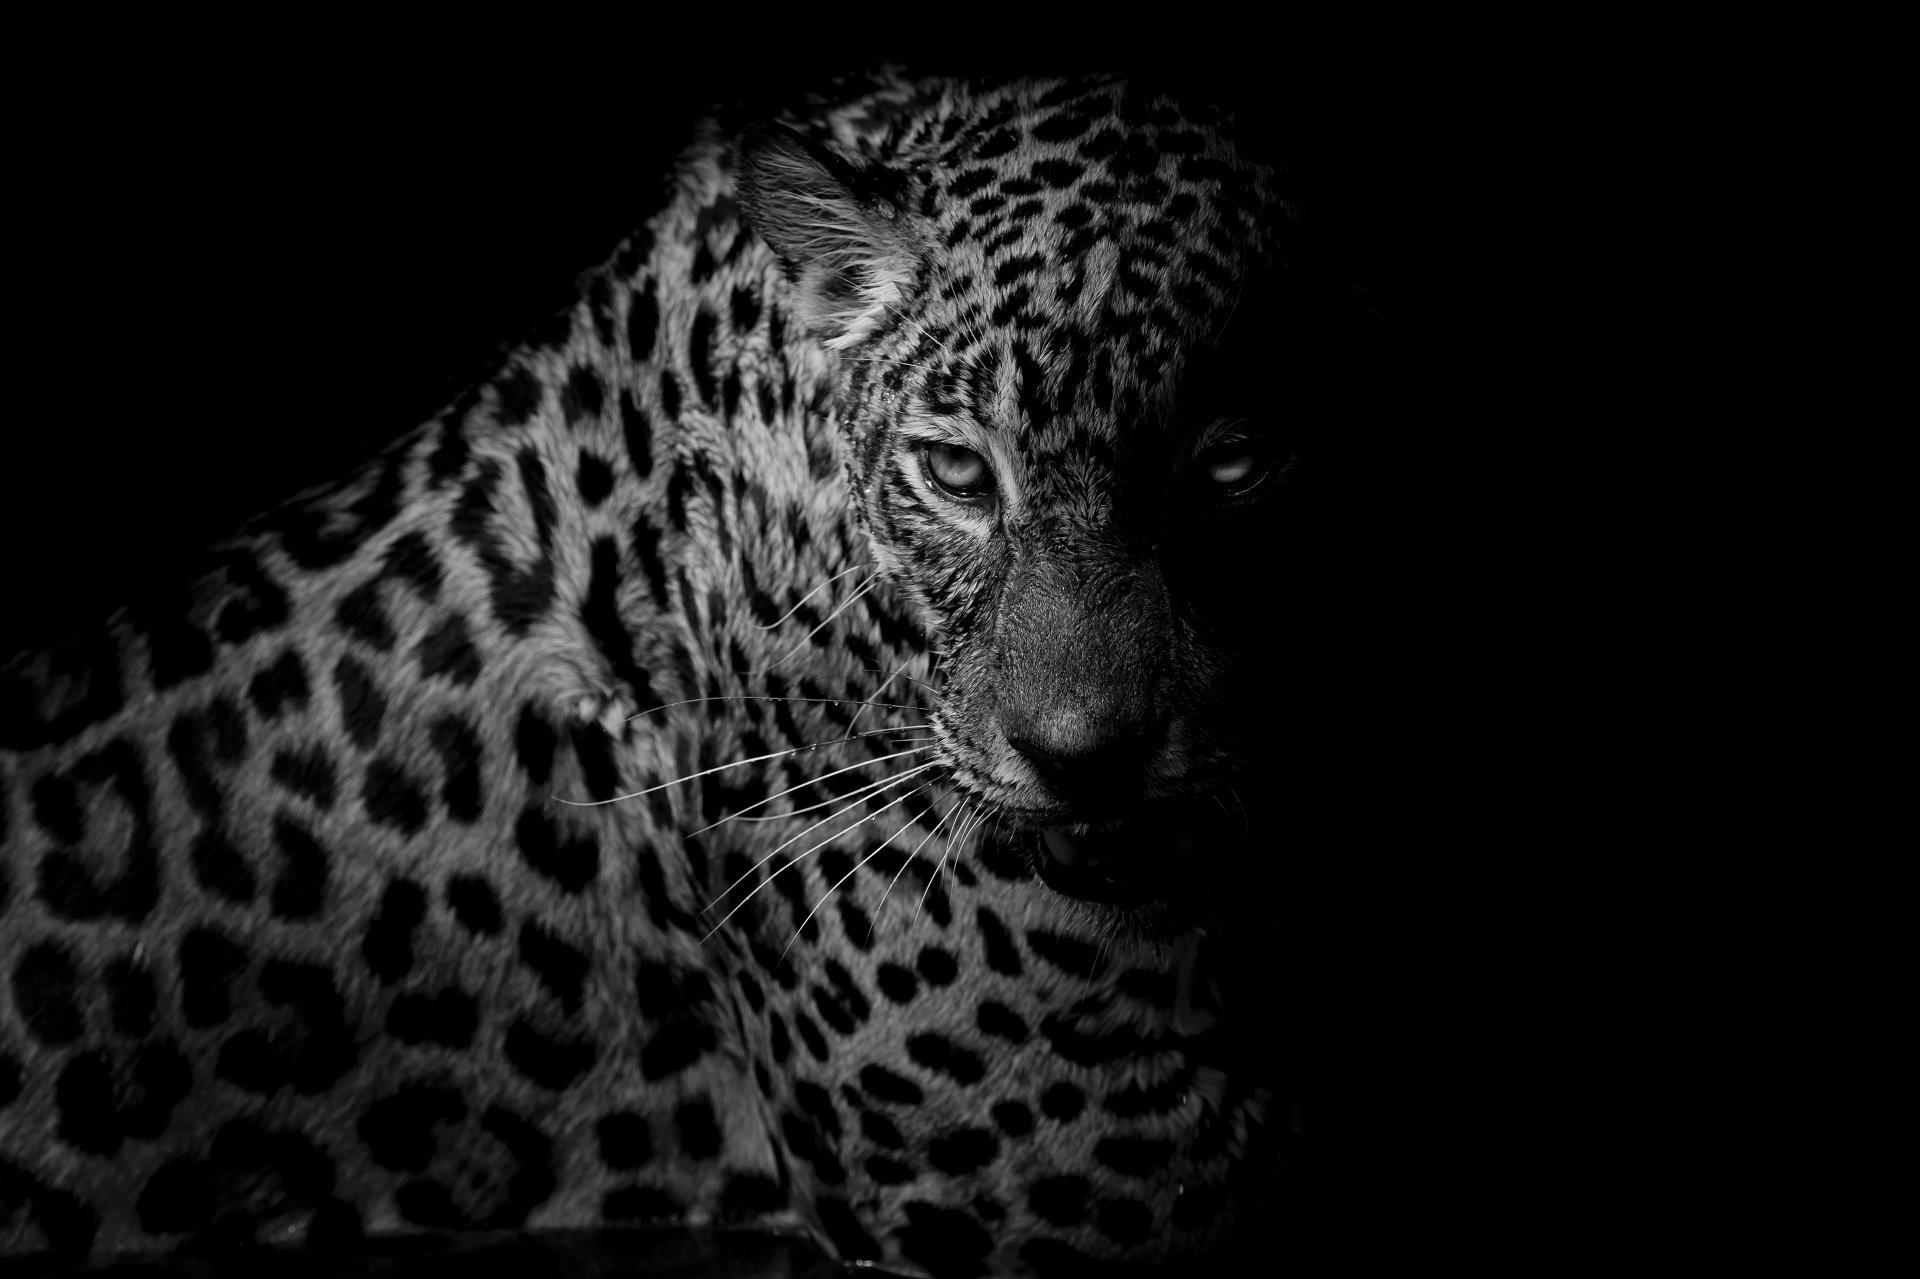 Black Leopard 2201164 Hd Wallpaper Backgrounds Download